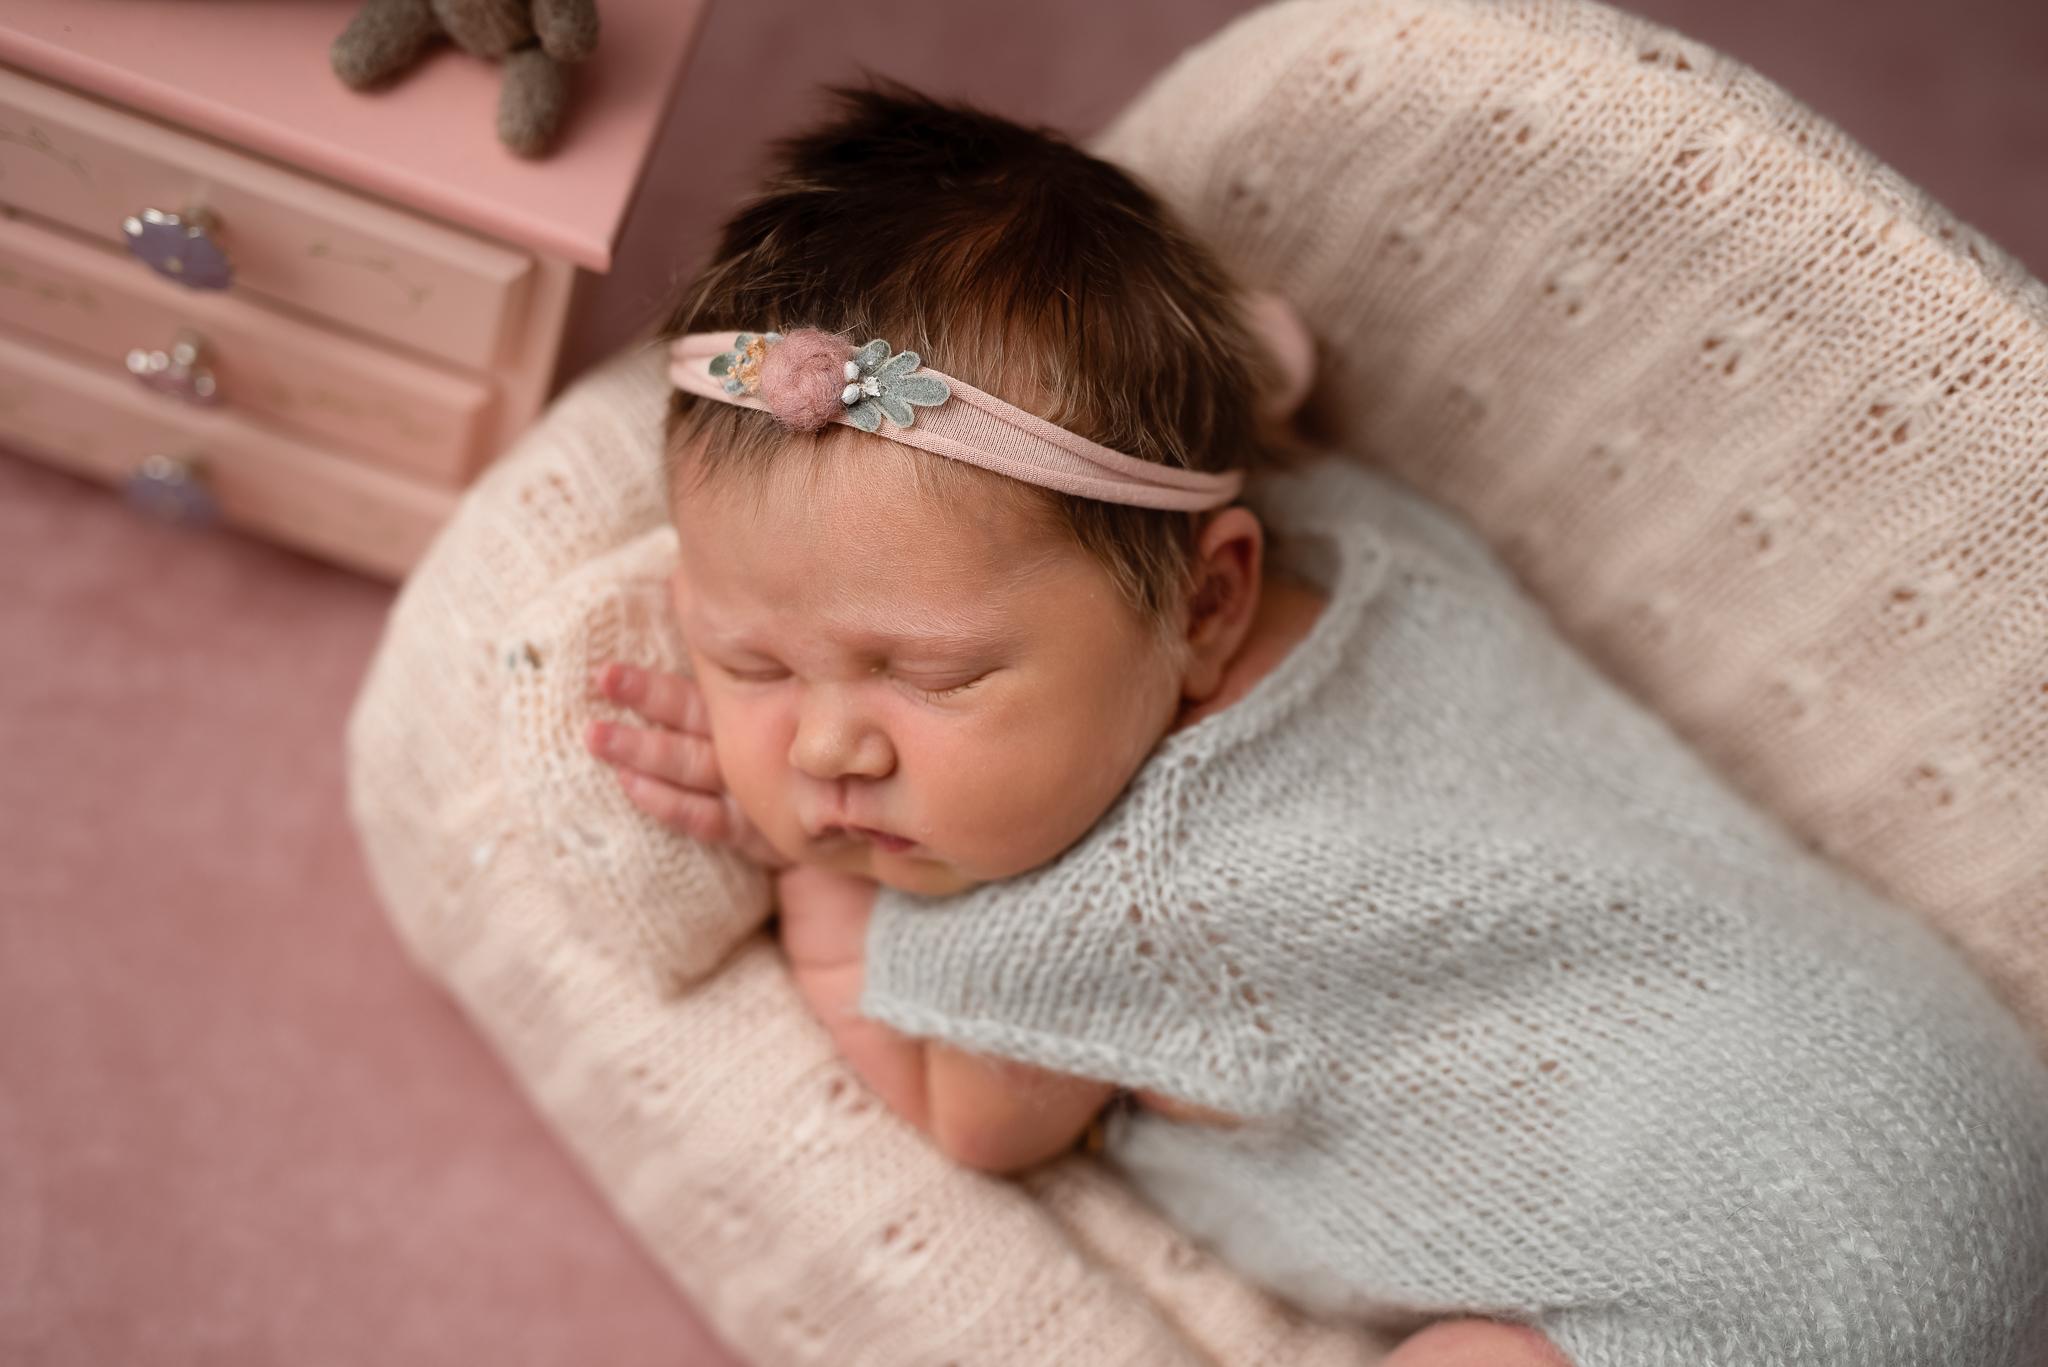 Newborn266NaomiLuciennePhotography062019-Edit.jpg